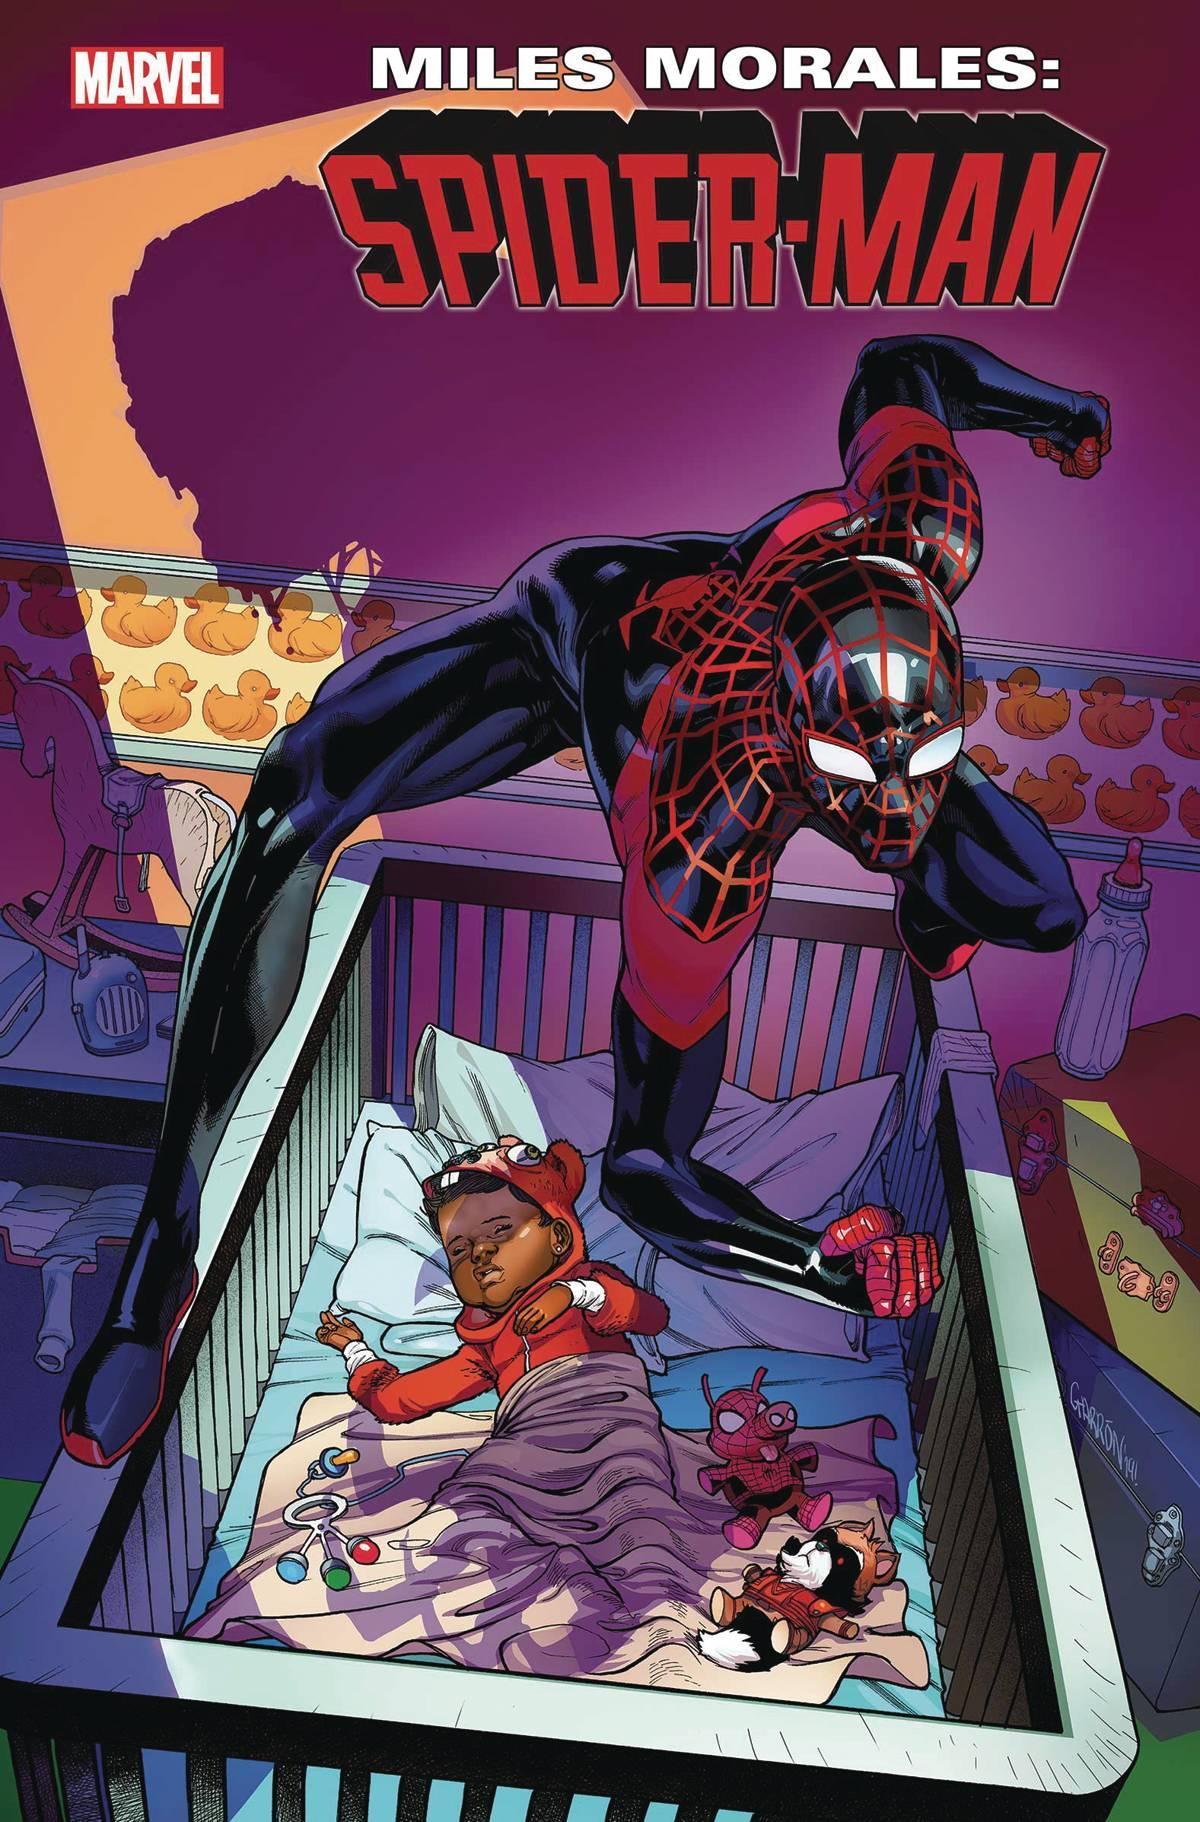 Miles Morales: Spider-Man #16 (2020)